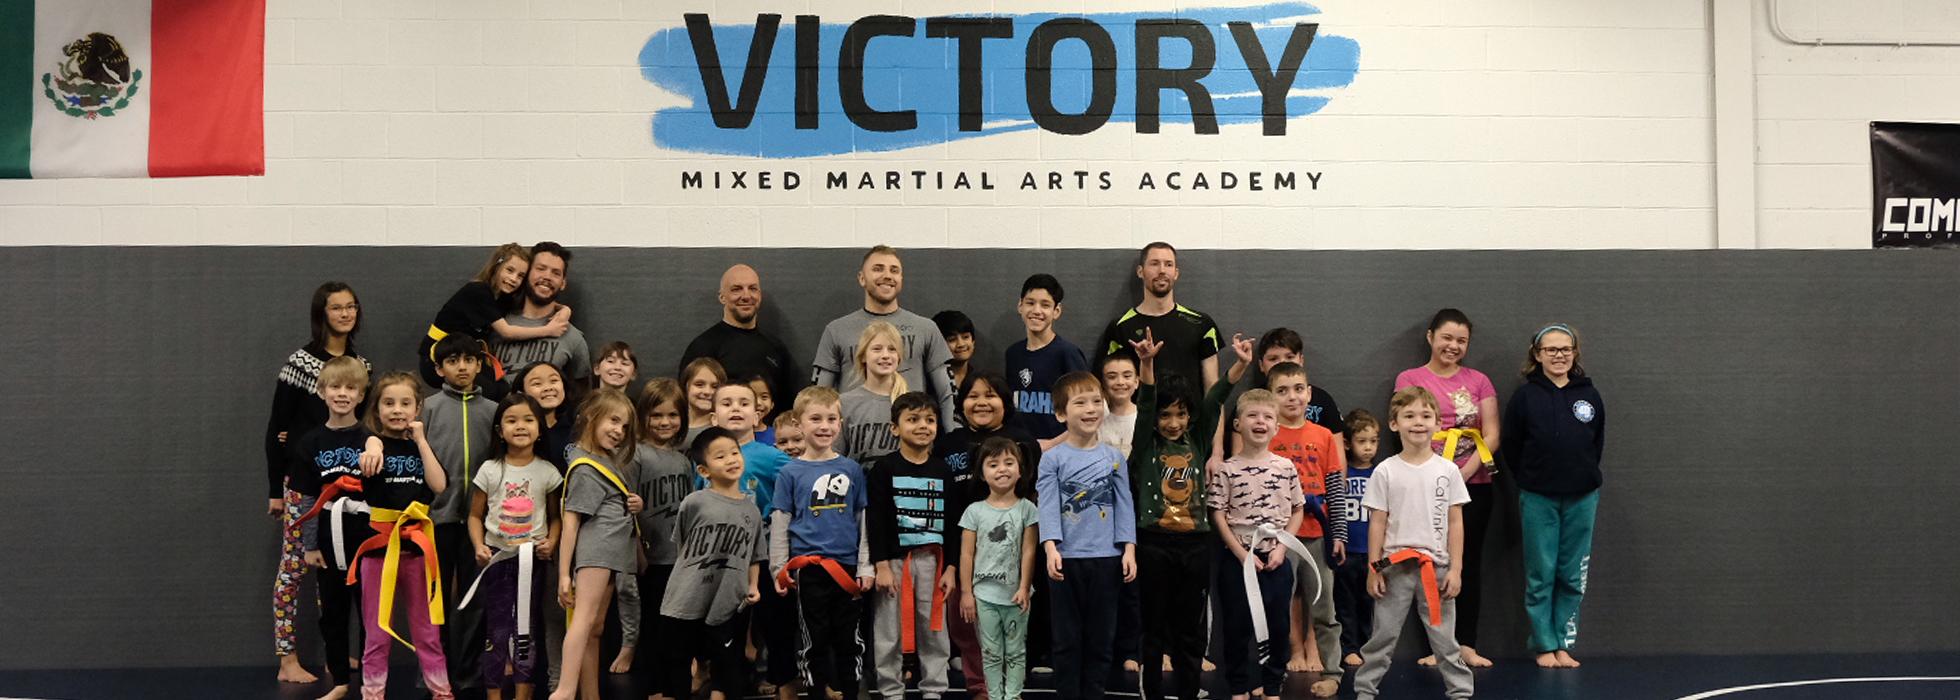 Kids Karate Classes in Arlington Heights IL, Kids Karate Classes near Schaumburg IL, Kids Karate Classes near Elk Grove Village IL, Kids Karate Classes near Mount Prospect IL, Kids Karate Classes near Palatine IL, Kids Karate Classes near Buffalo Grove IL